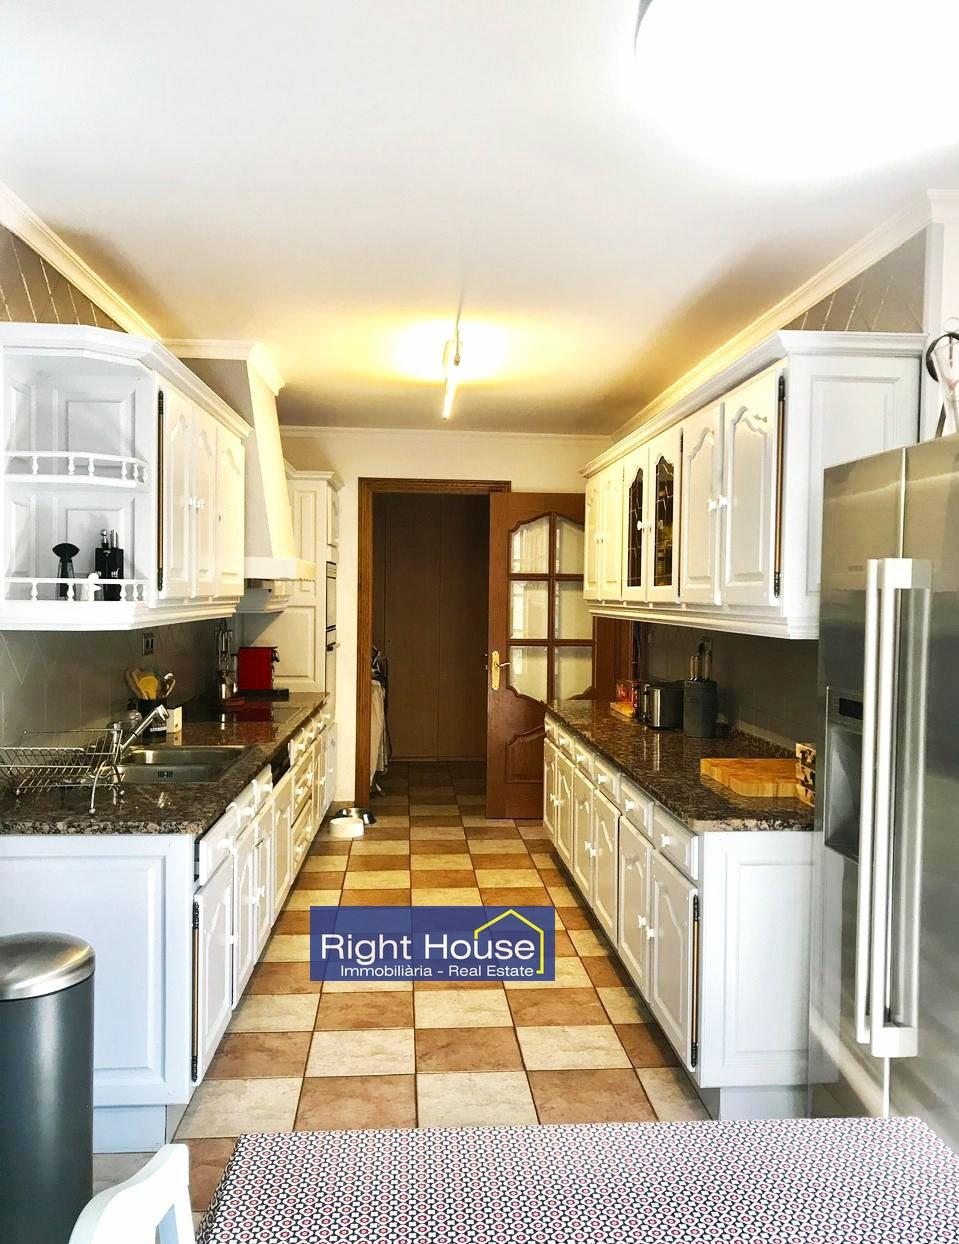 Pis en venda a Sispony, 3 habitacions, 156 metres